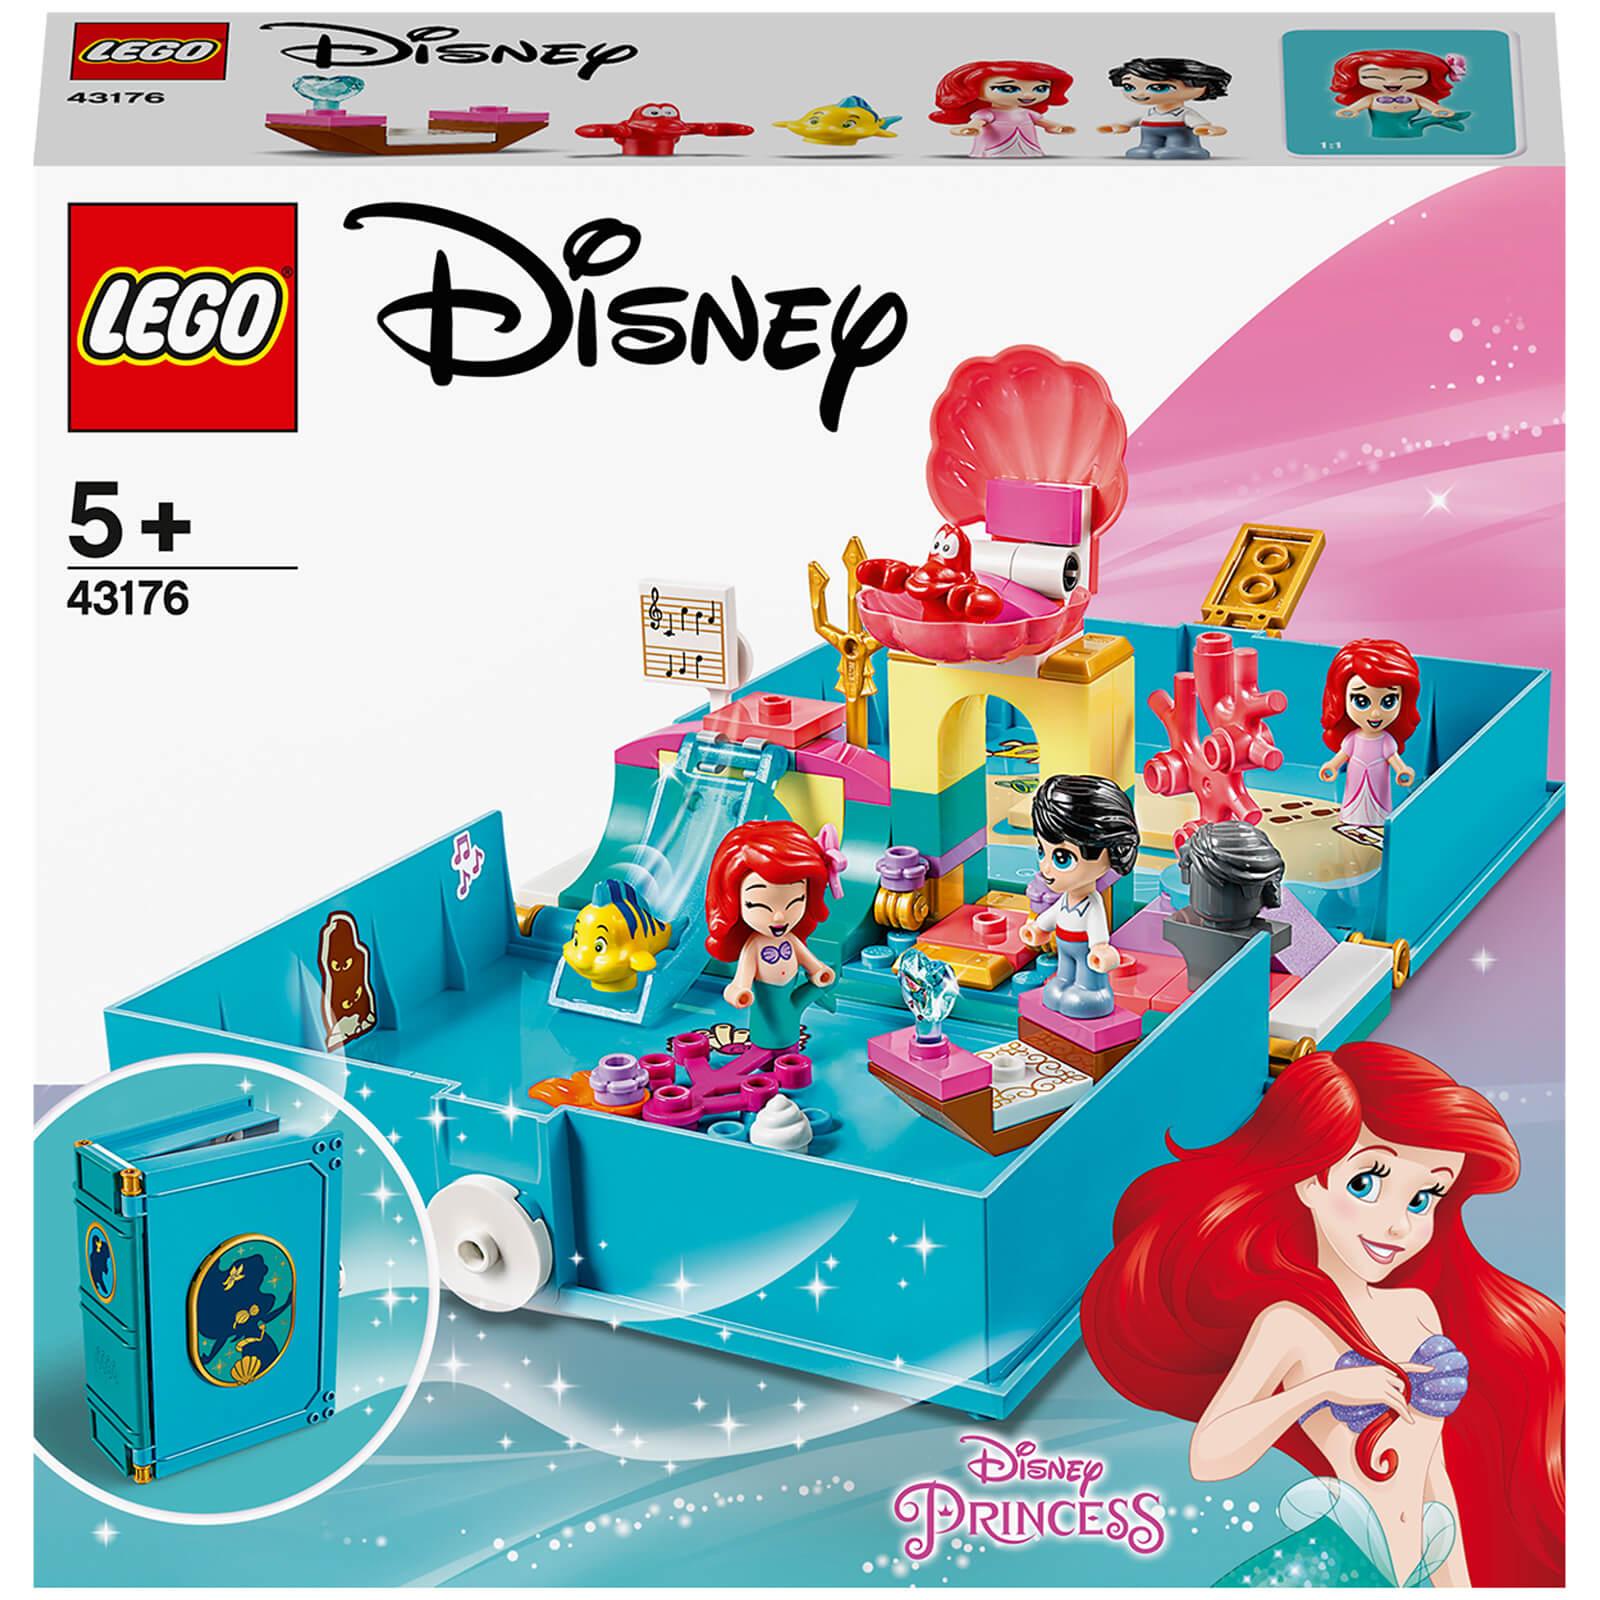 Image of 43176 LEGO® DISNEY Arielles fairytale book